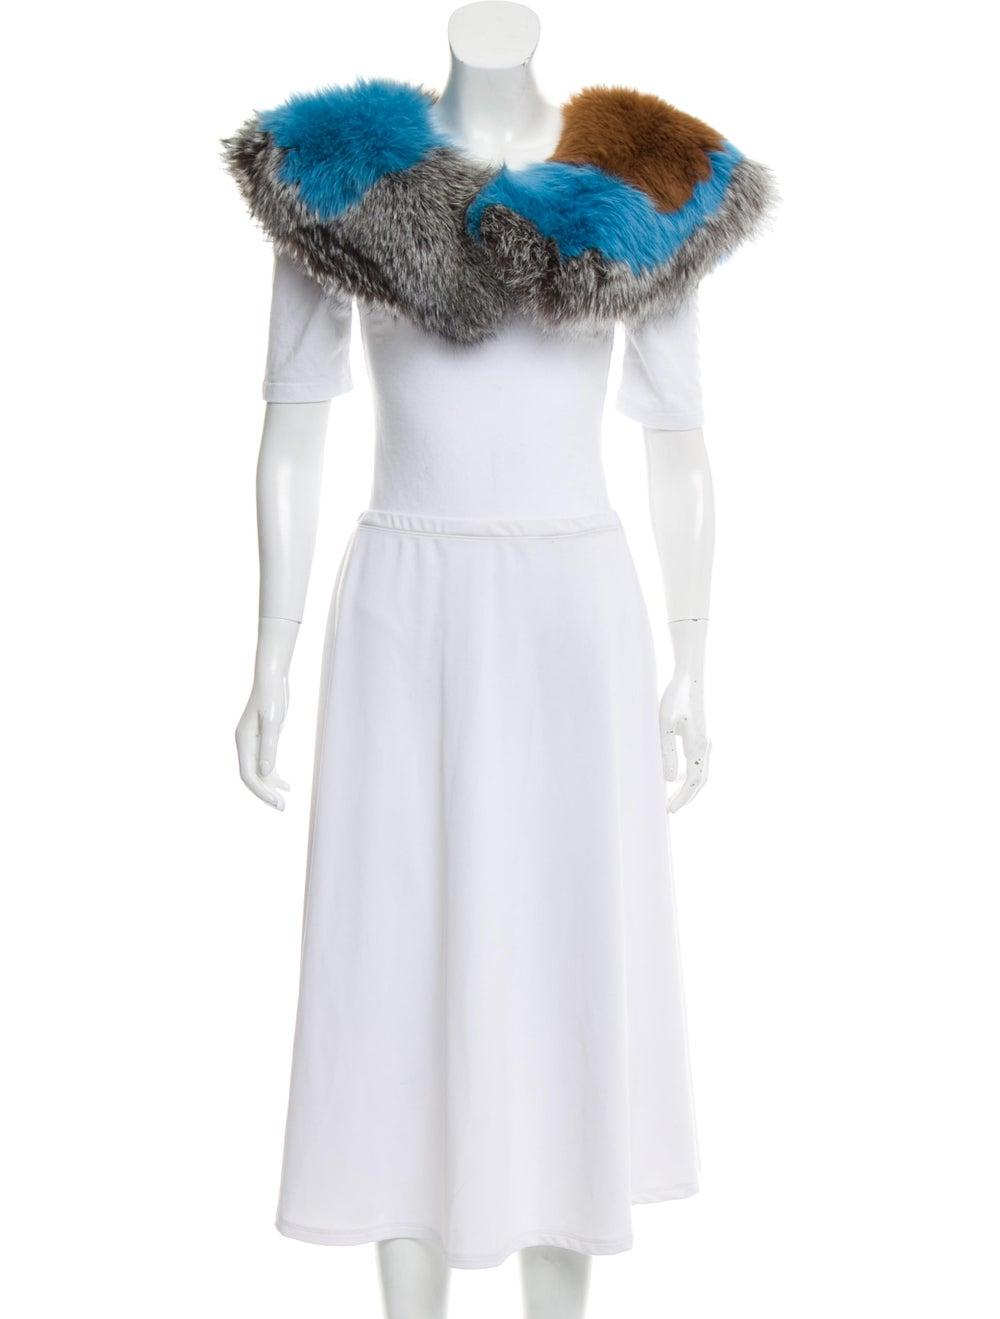 Fur Fox Fur Stole Blue - image 3